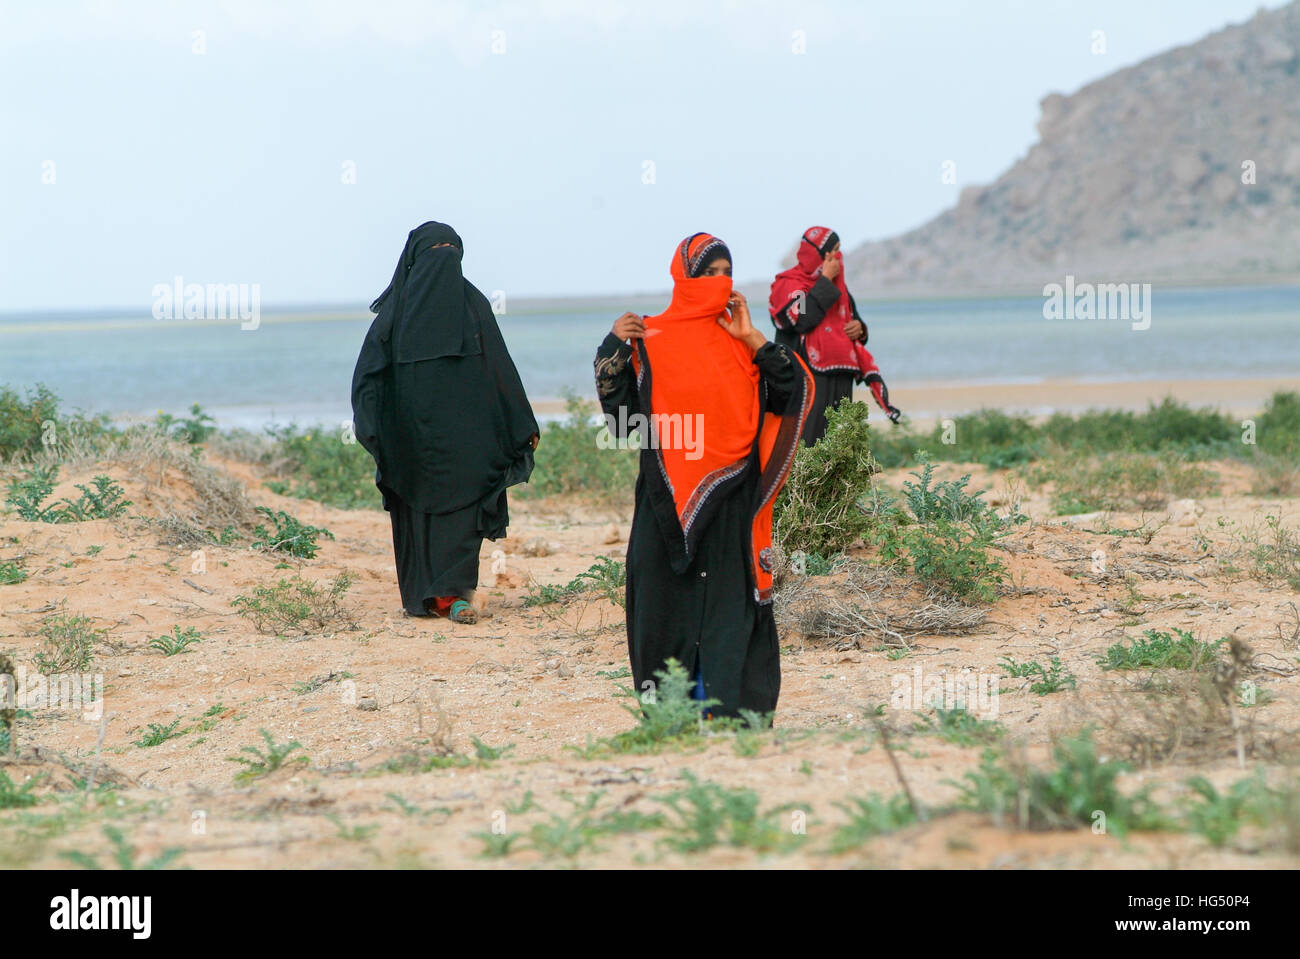 Socotra island, Yemen - 16 January 2008: women dressed in the burqa on the countryside of Socotra island, Yemen - Stock Image